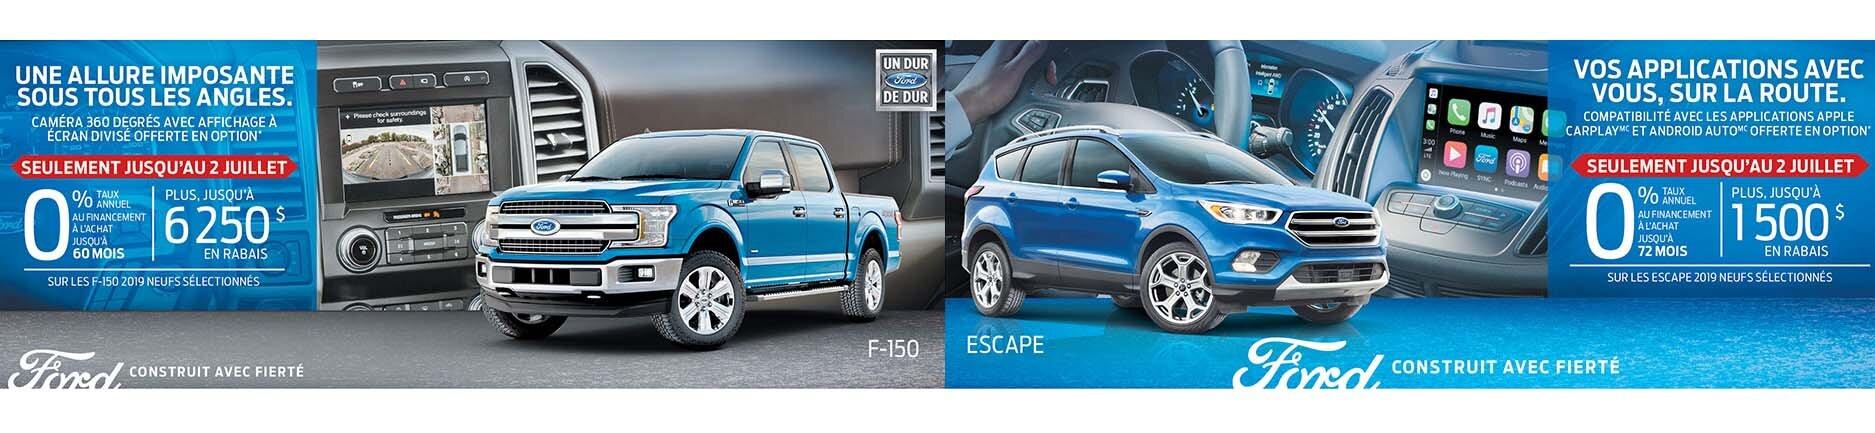 Ford-2019-promo.jpg